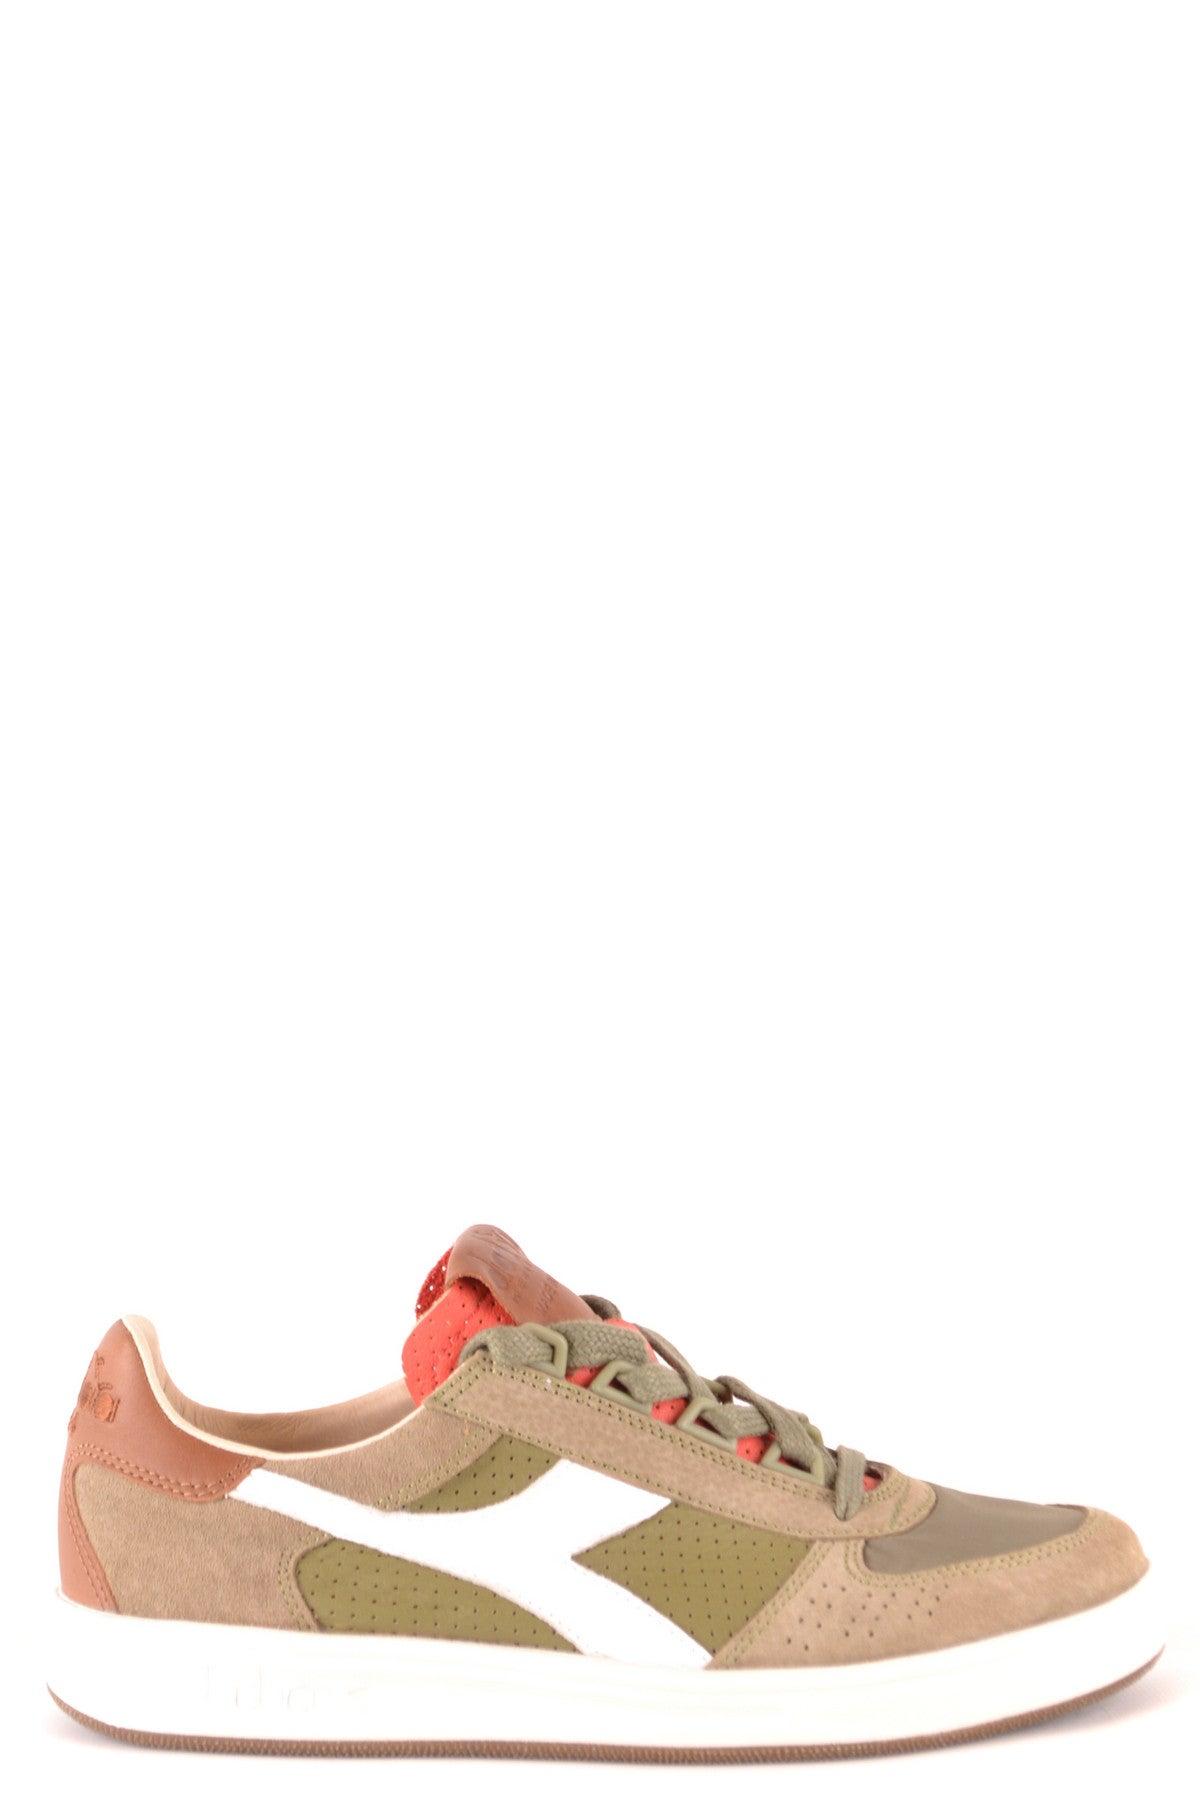 Diadora Men's Sneakers In Green